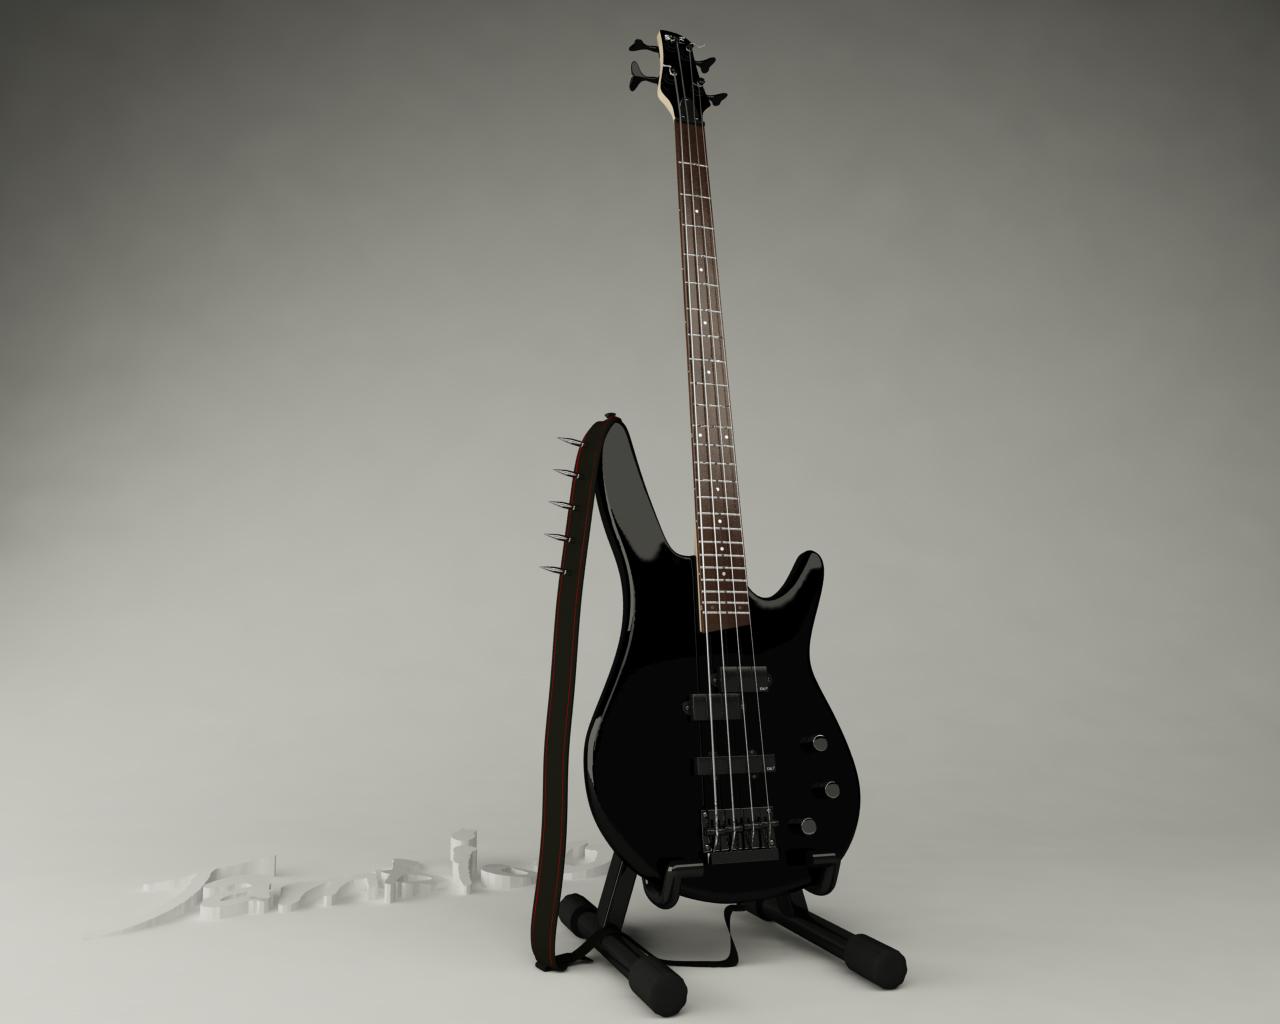 Ibanez Guitar Wallpaper: Ibanez SDGR Bass Guitar By JambioO On DeviantArt